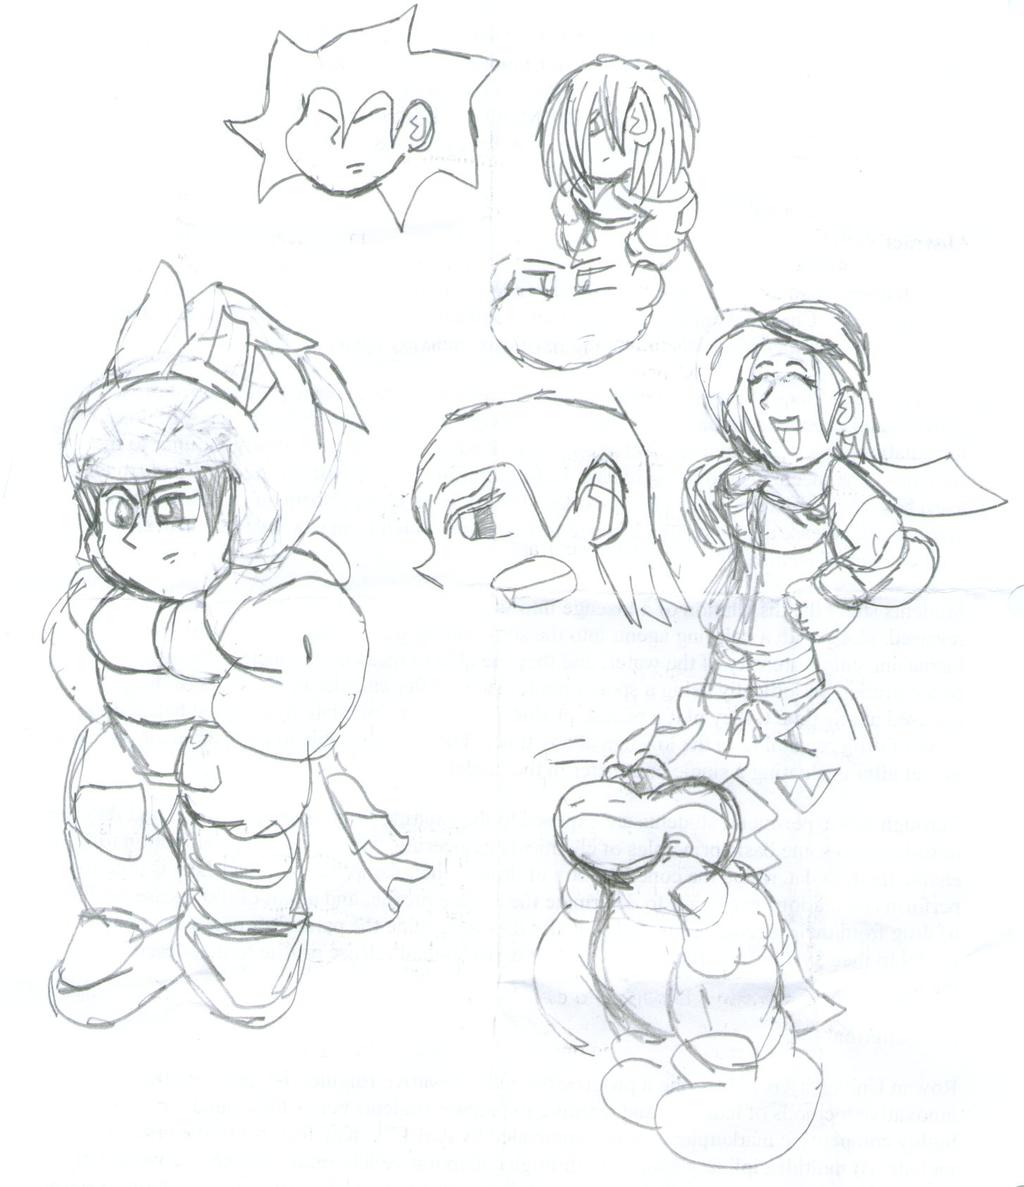 2004: Drunken Yoshi and More